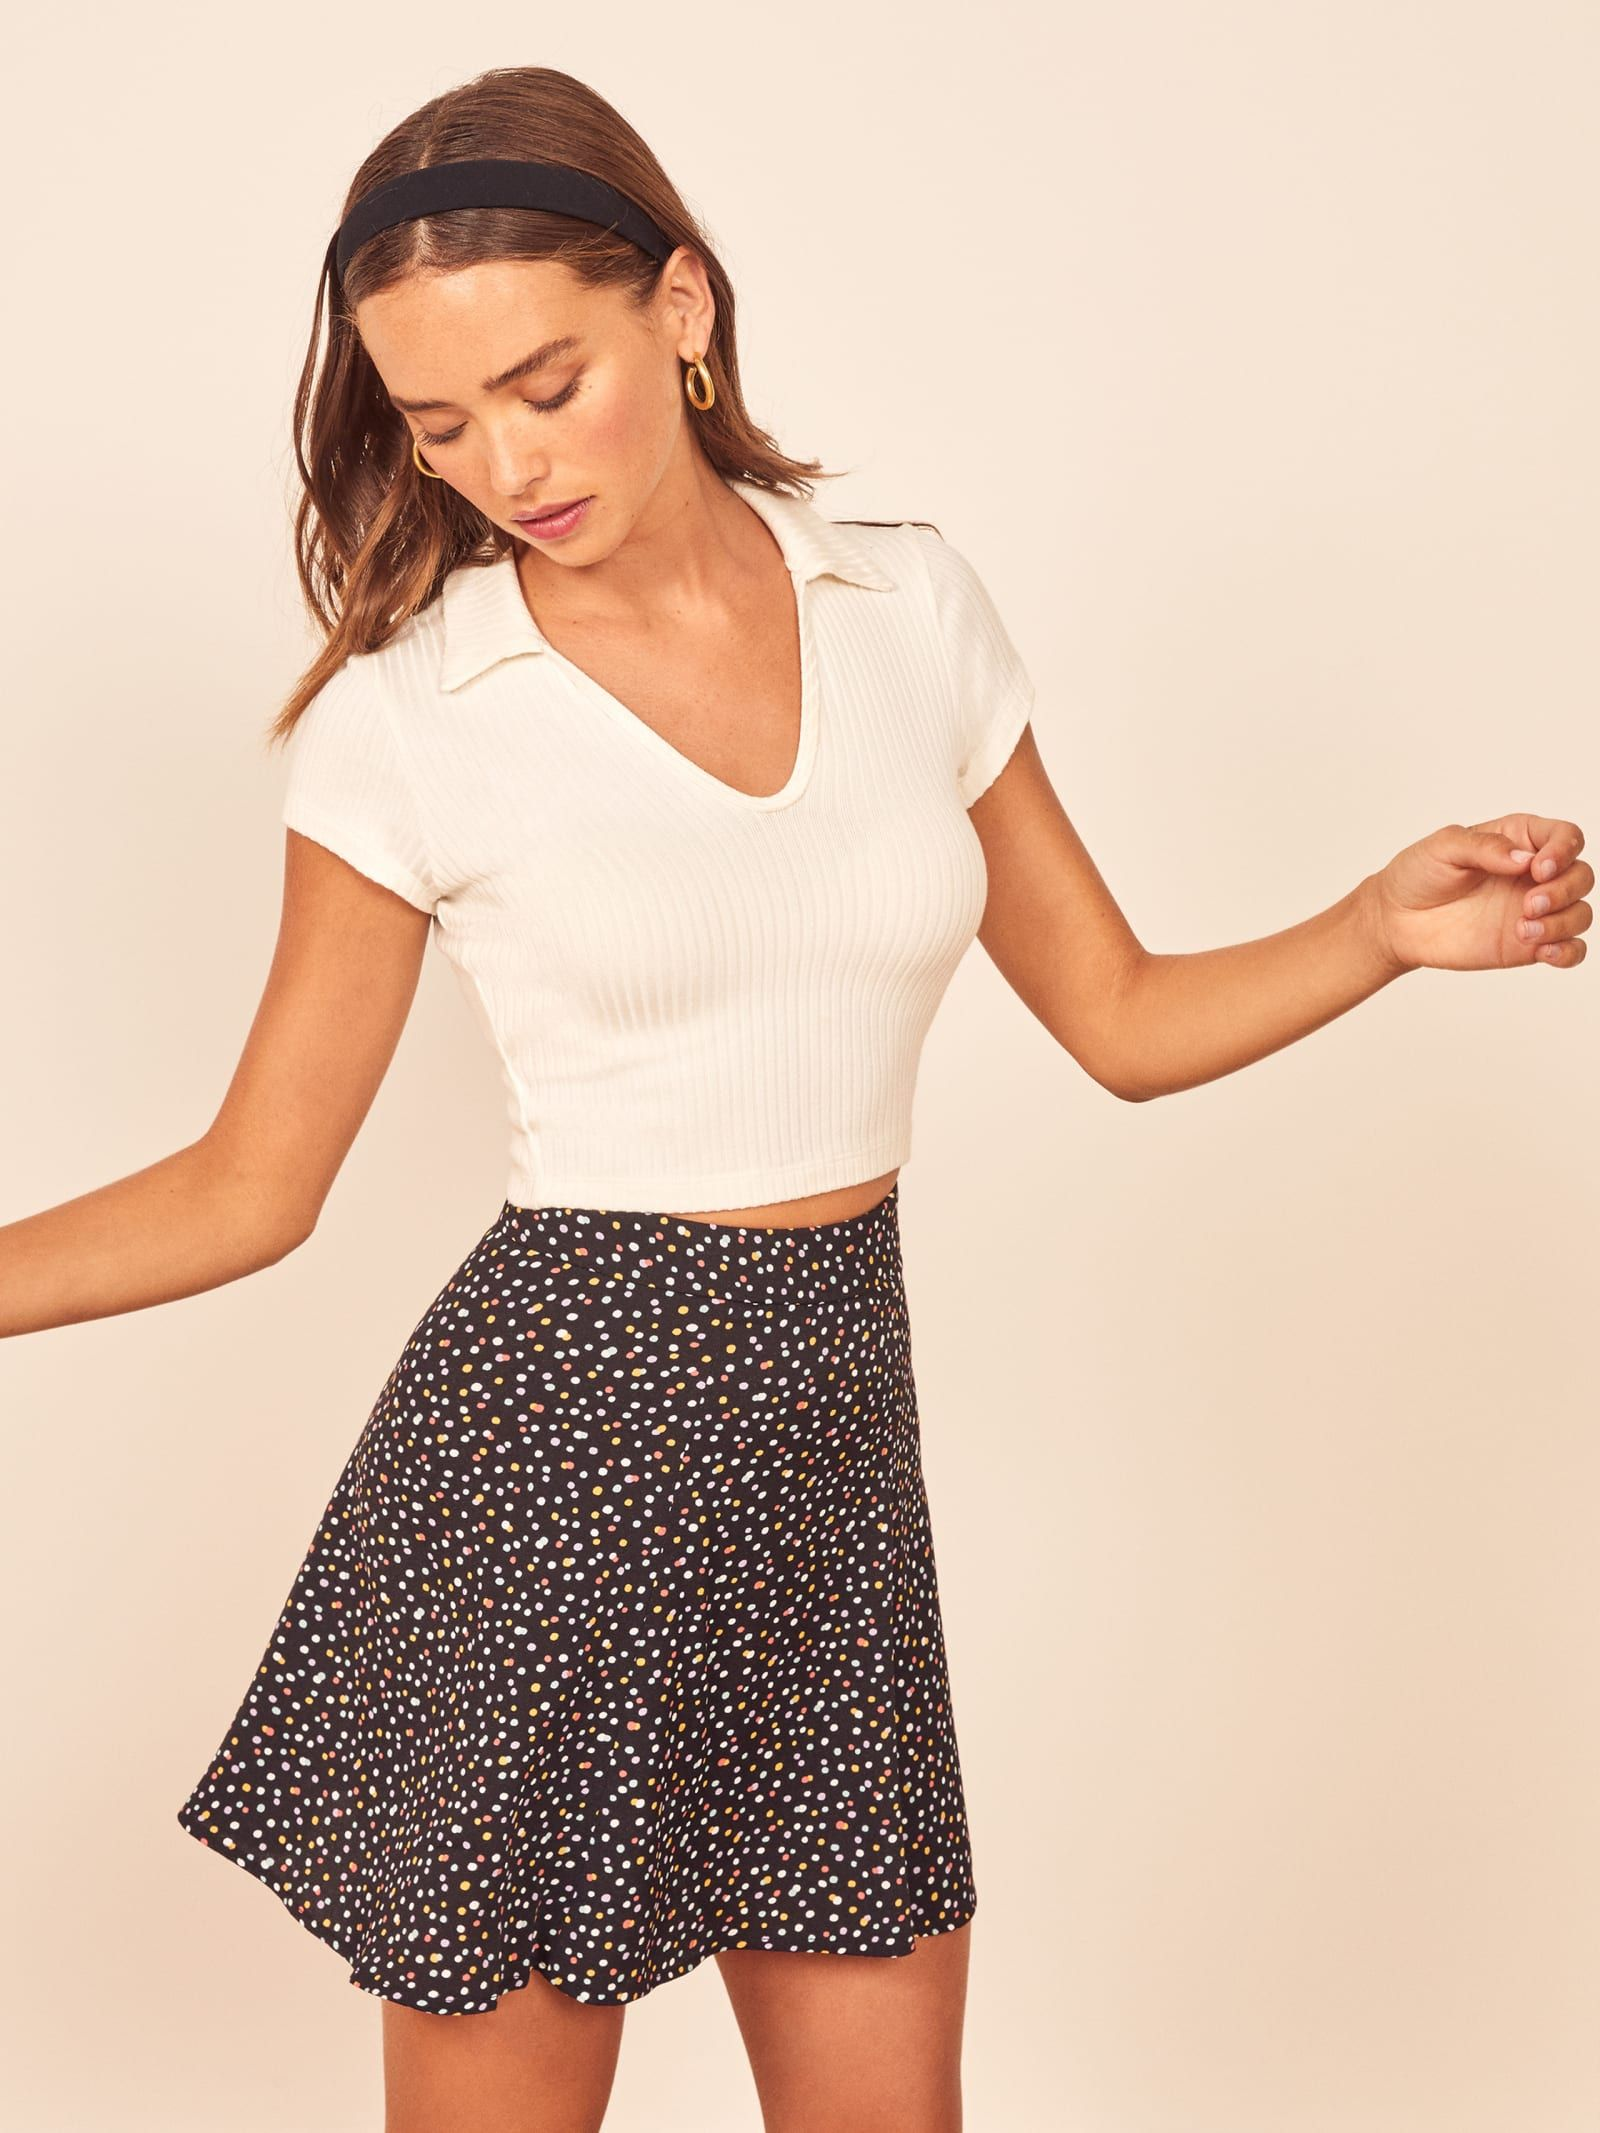 Flounce Skirt Fashion Inspo Outfits Casual Dresses Mini Skirts [ 2133 x 1600 Pixel ]